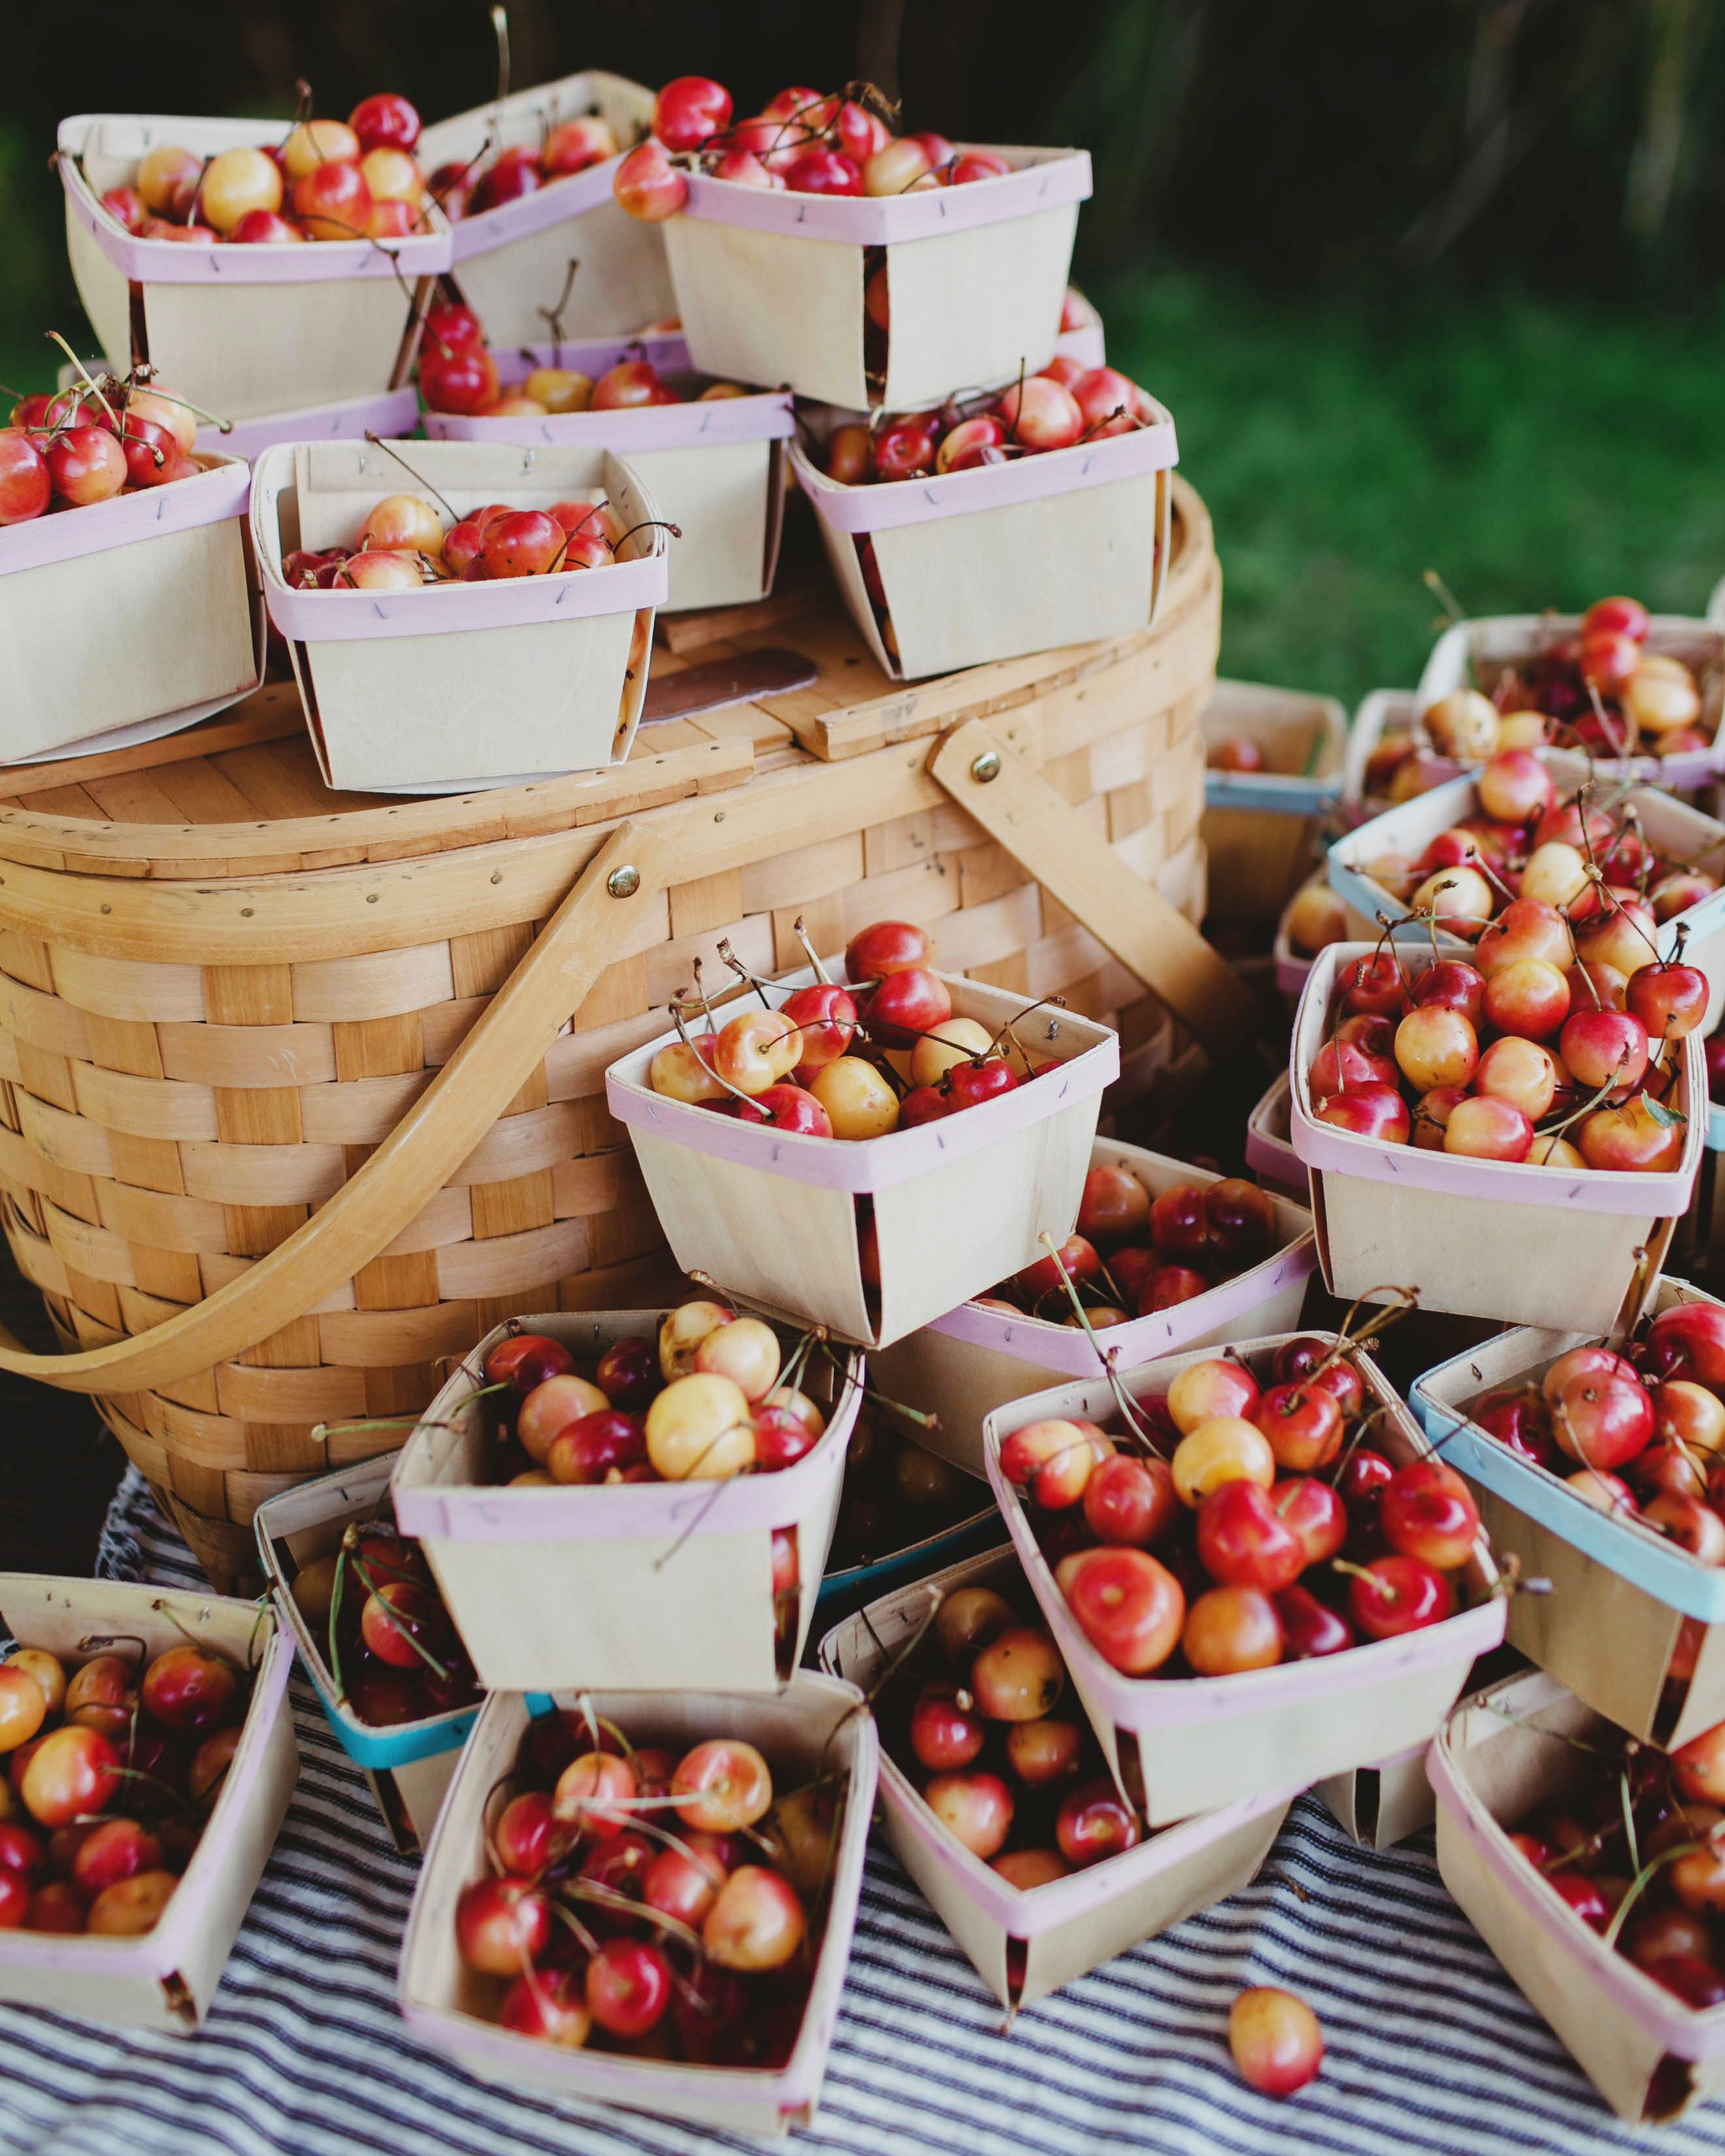 add-fresh-produce-valley--co-events-0616.jpg